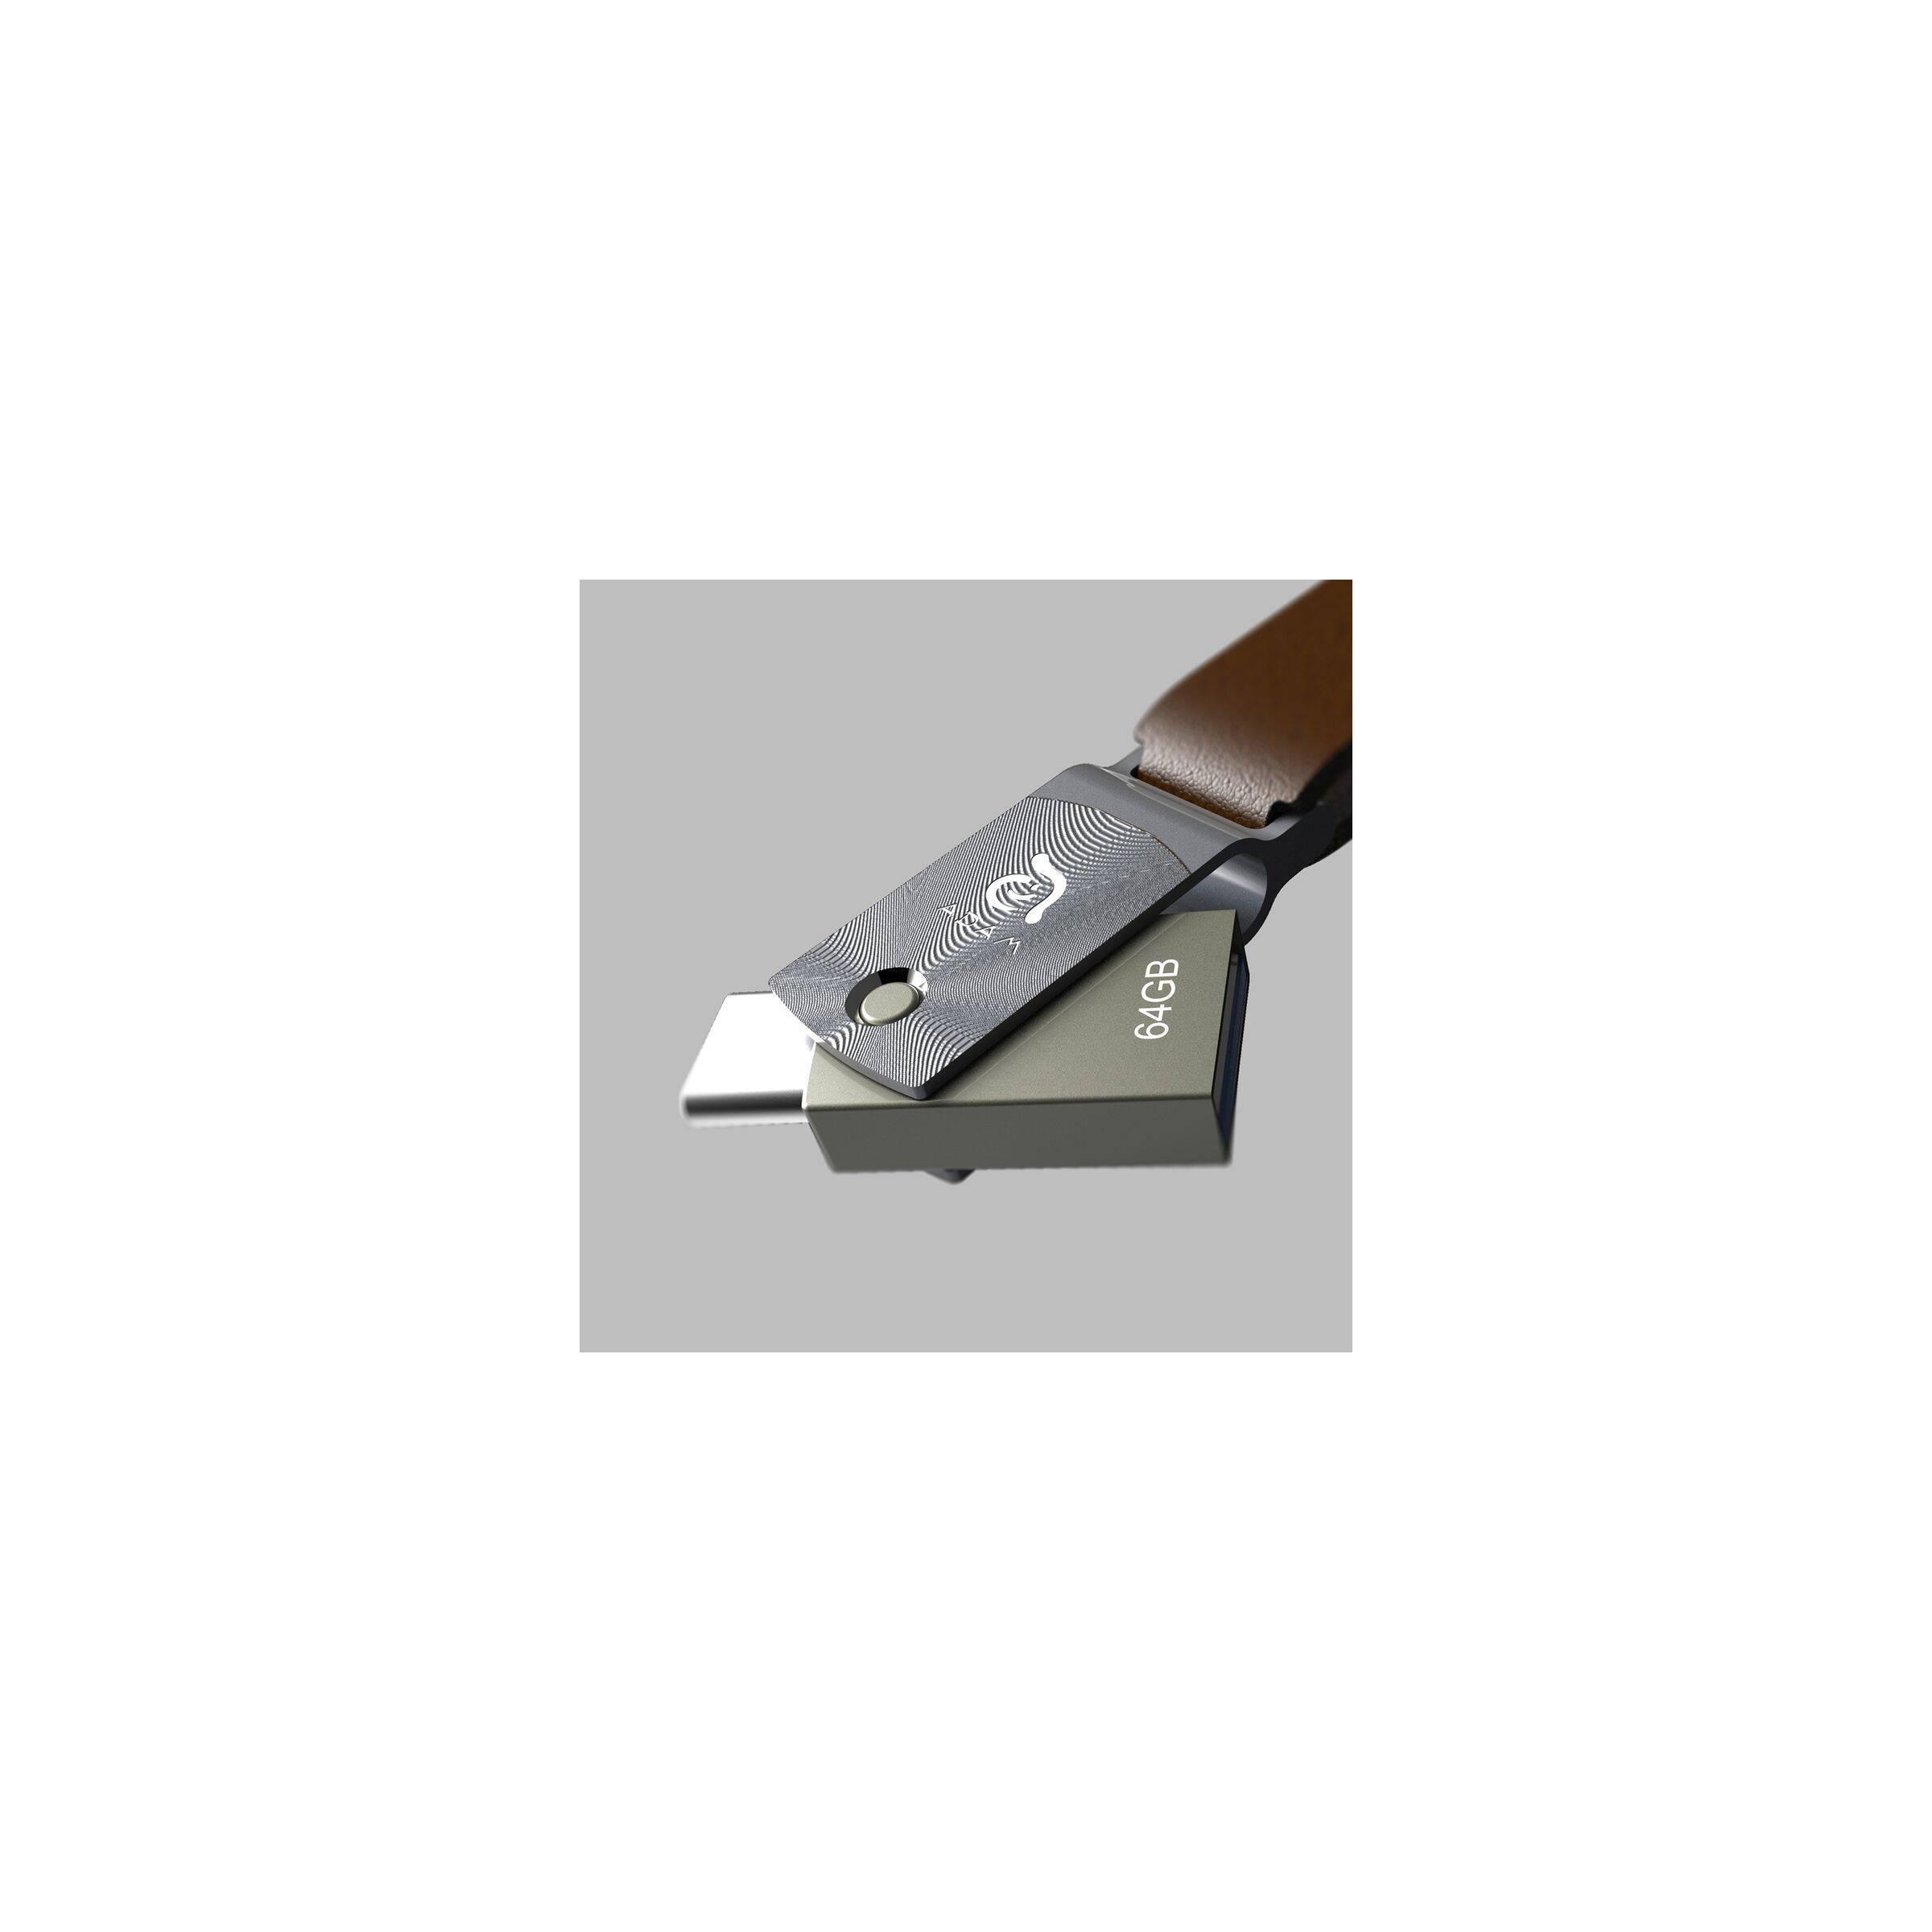 adam elements – usb 3.1 type c (usb-c) stik og adaptere